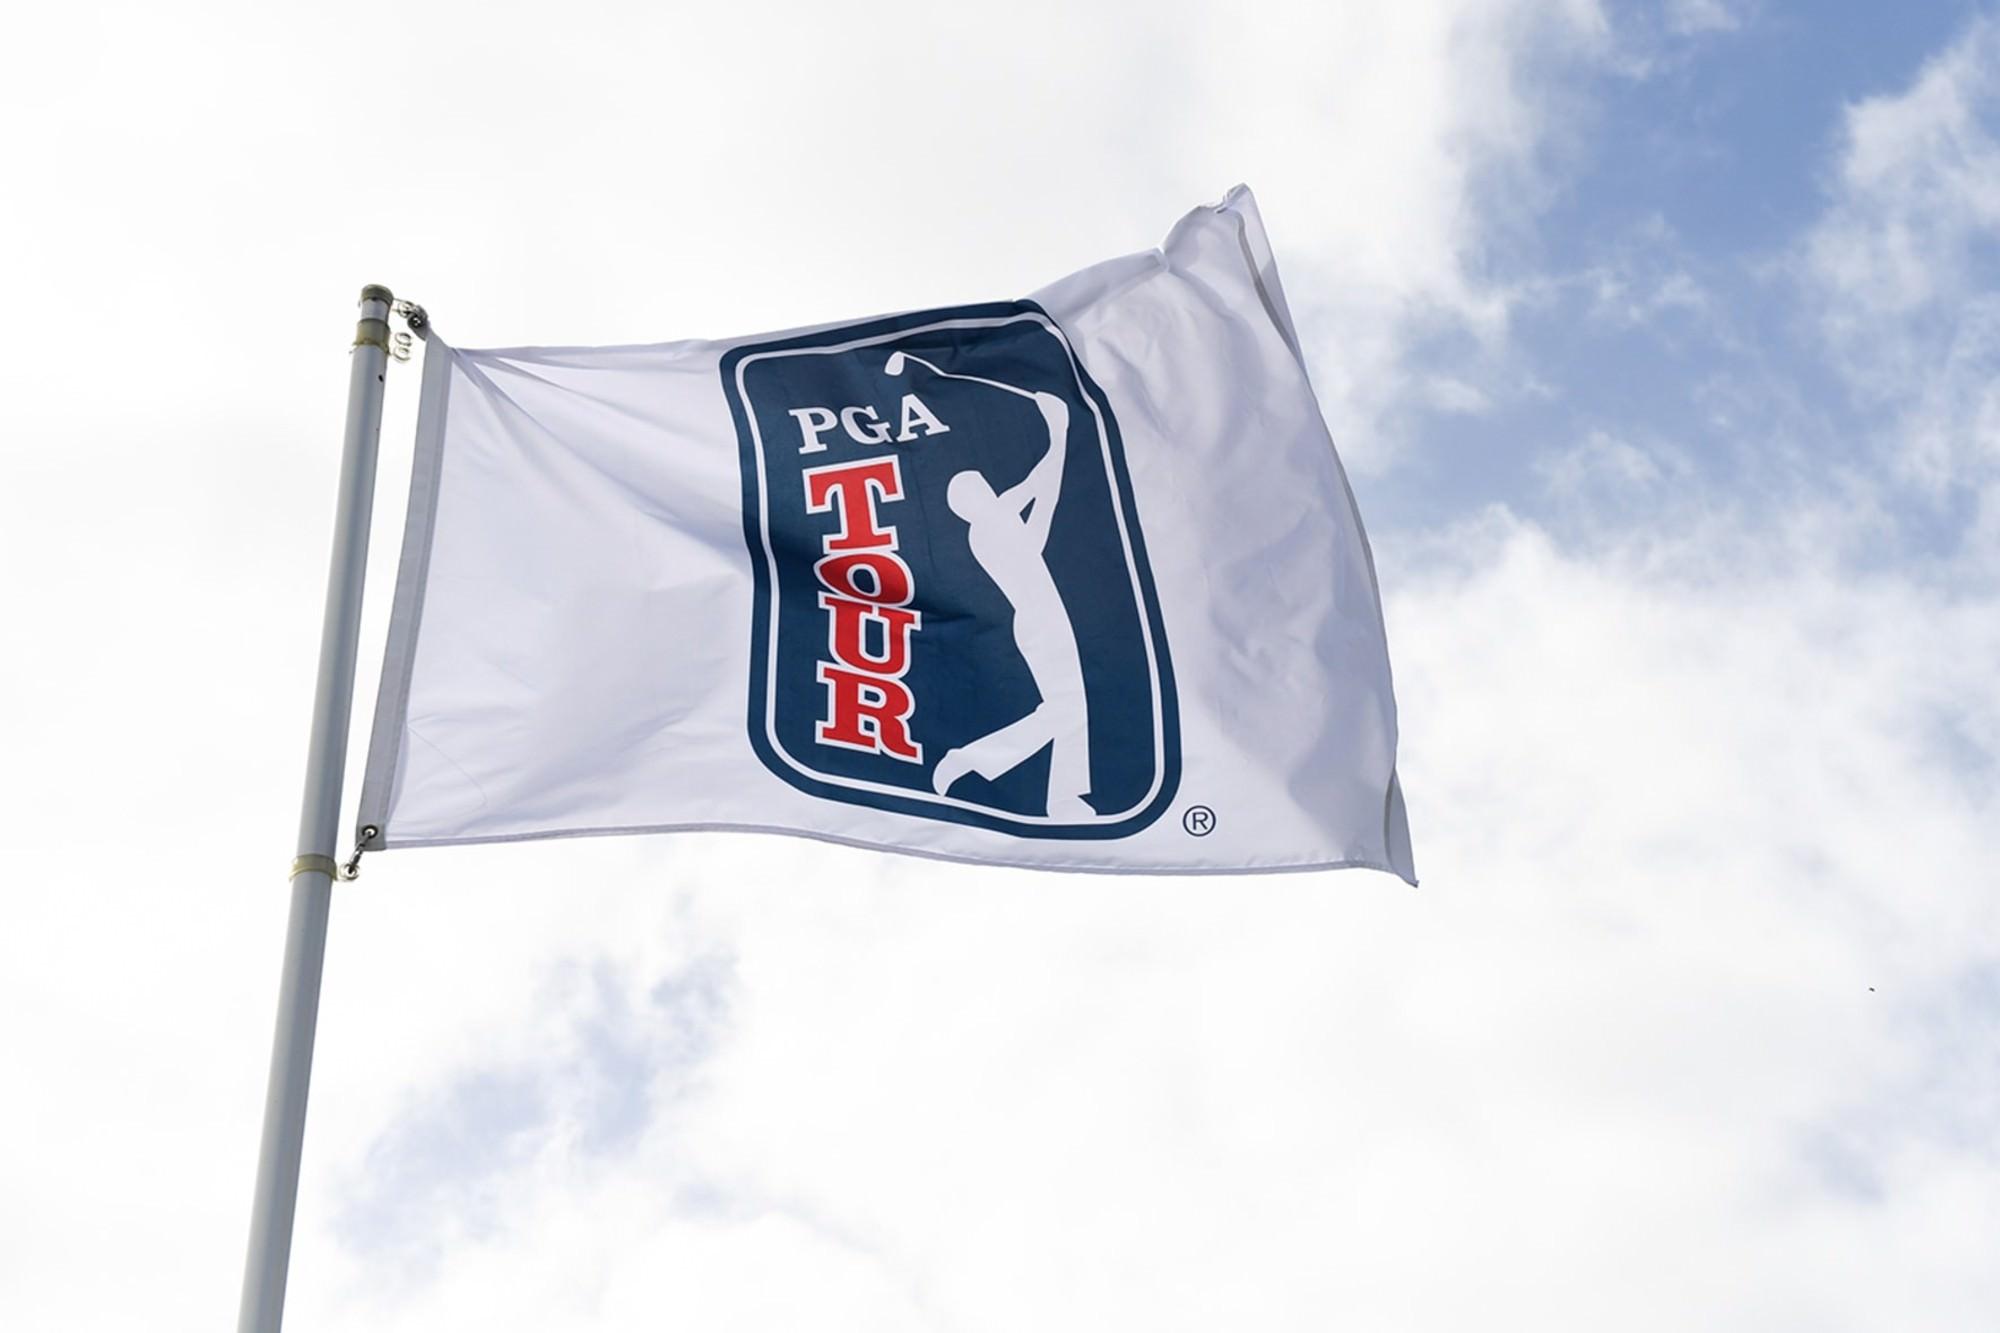 Biggest prize pools in PGA History   National Club Golfer